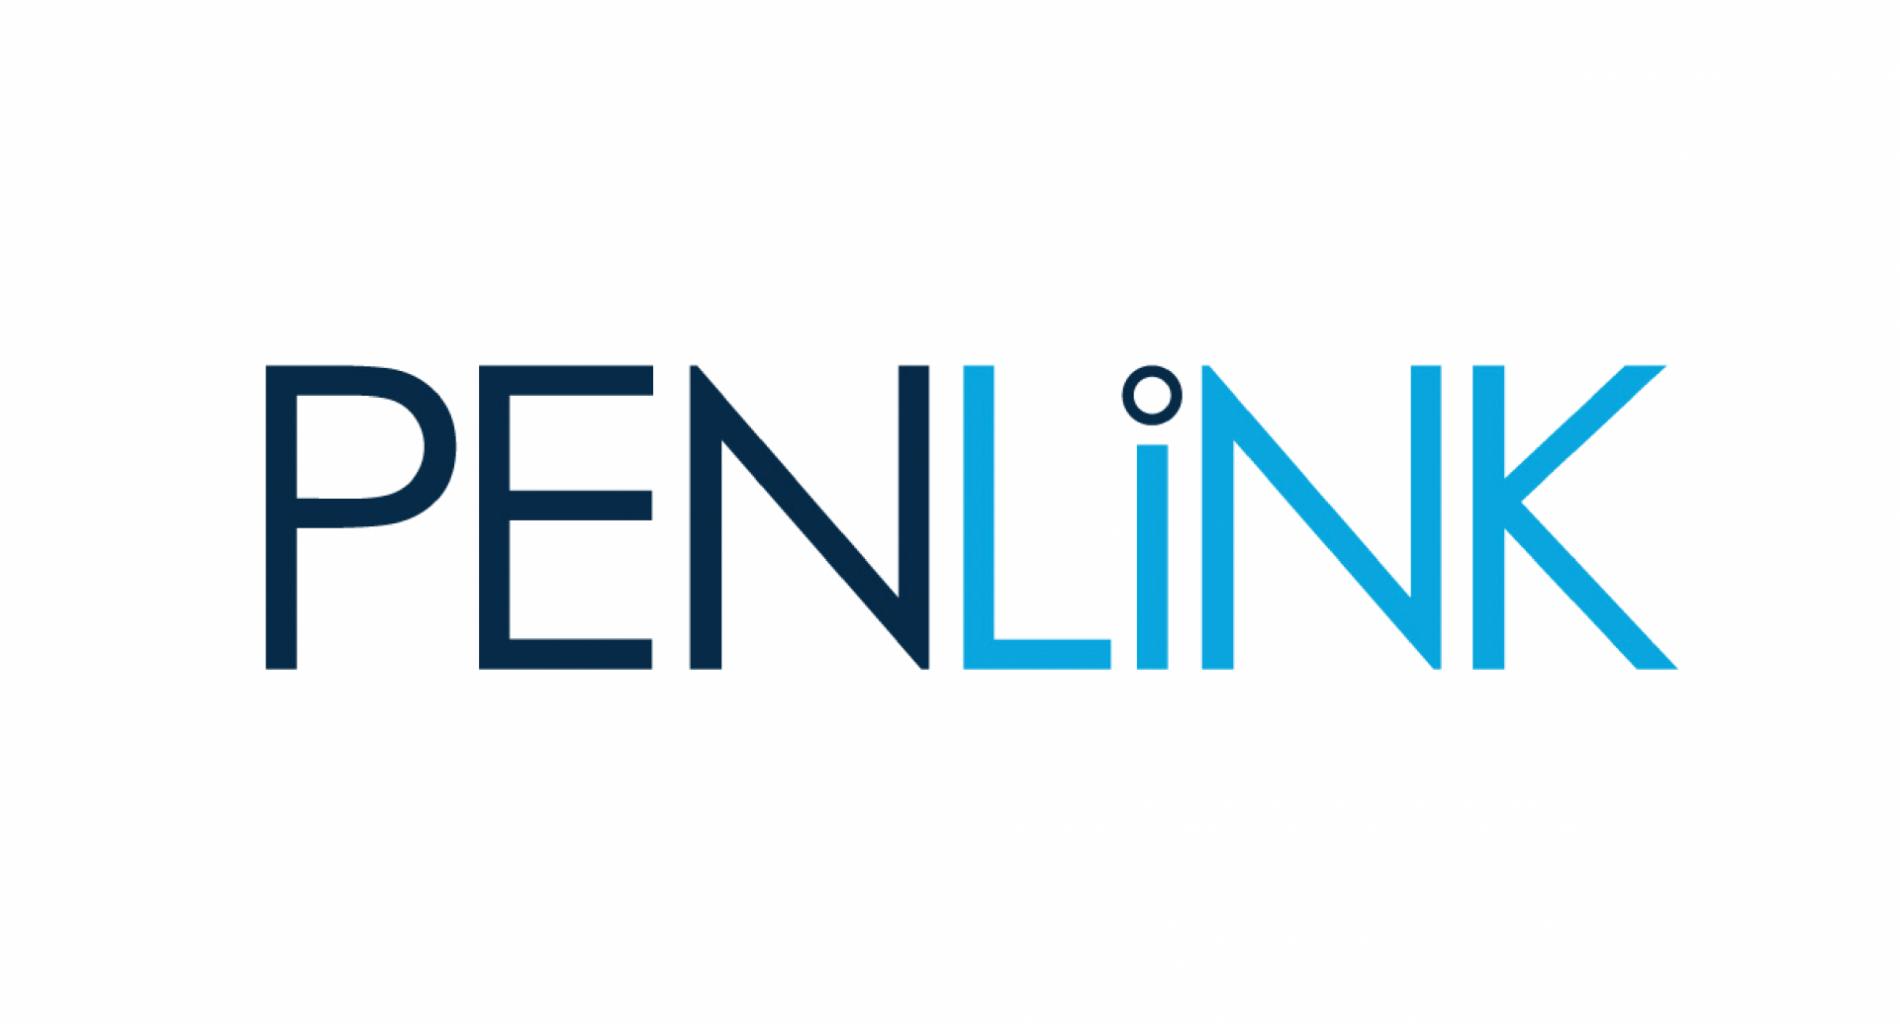 Pen Link logo